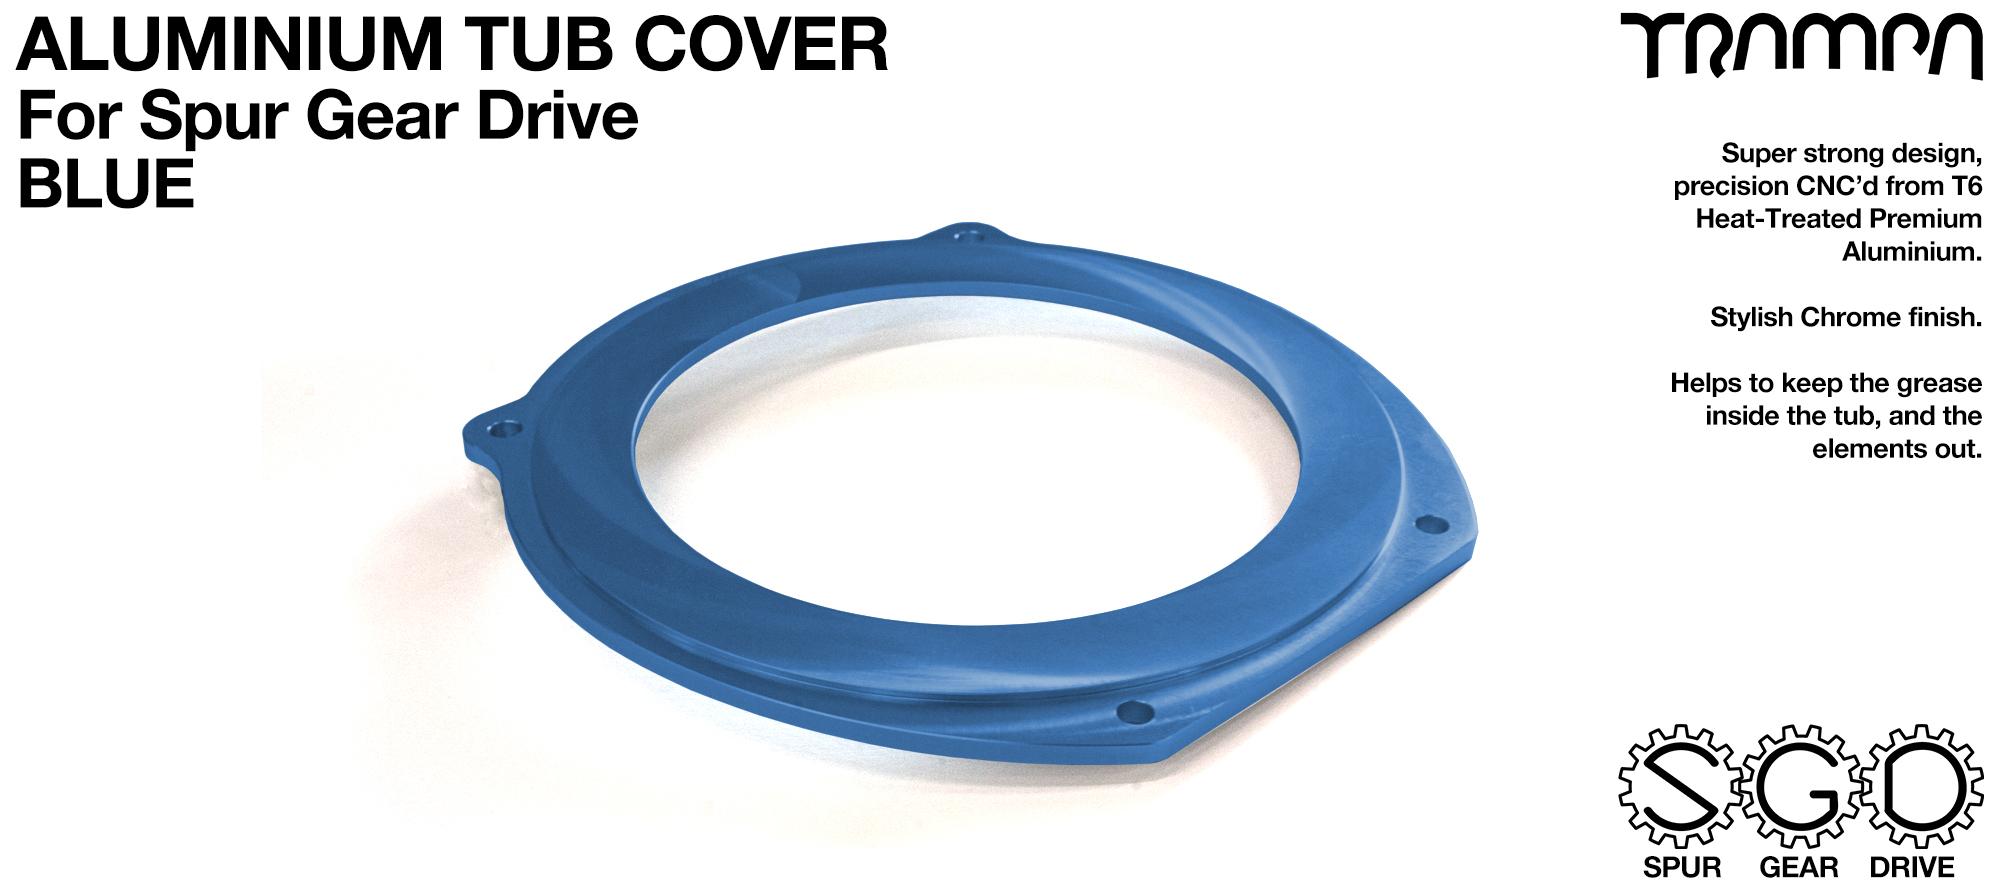 TRAMPA MKII Spur Gear Drive T6 Aluminium Tub Cover - BLUE